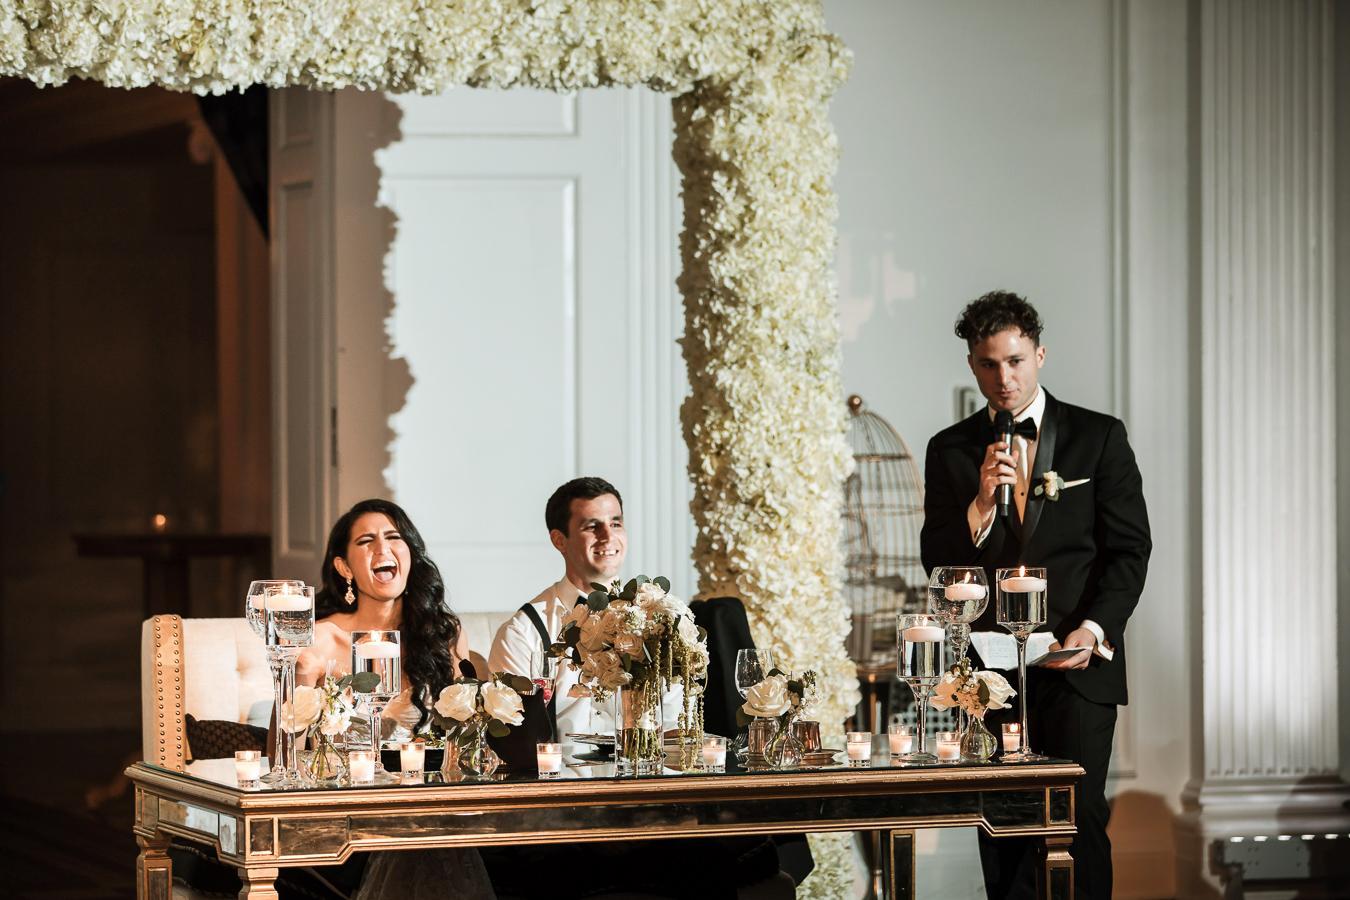 Modern Philadelphia Wedding At The Downtown Club Anastasia Romanova Photography Philly In Love Philadelphia Weddings Venues Vendors